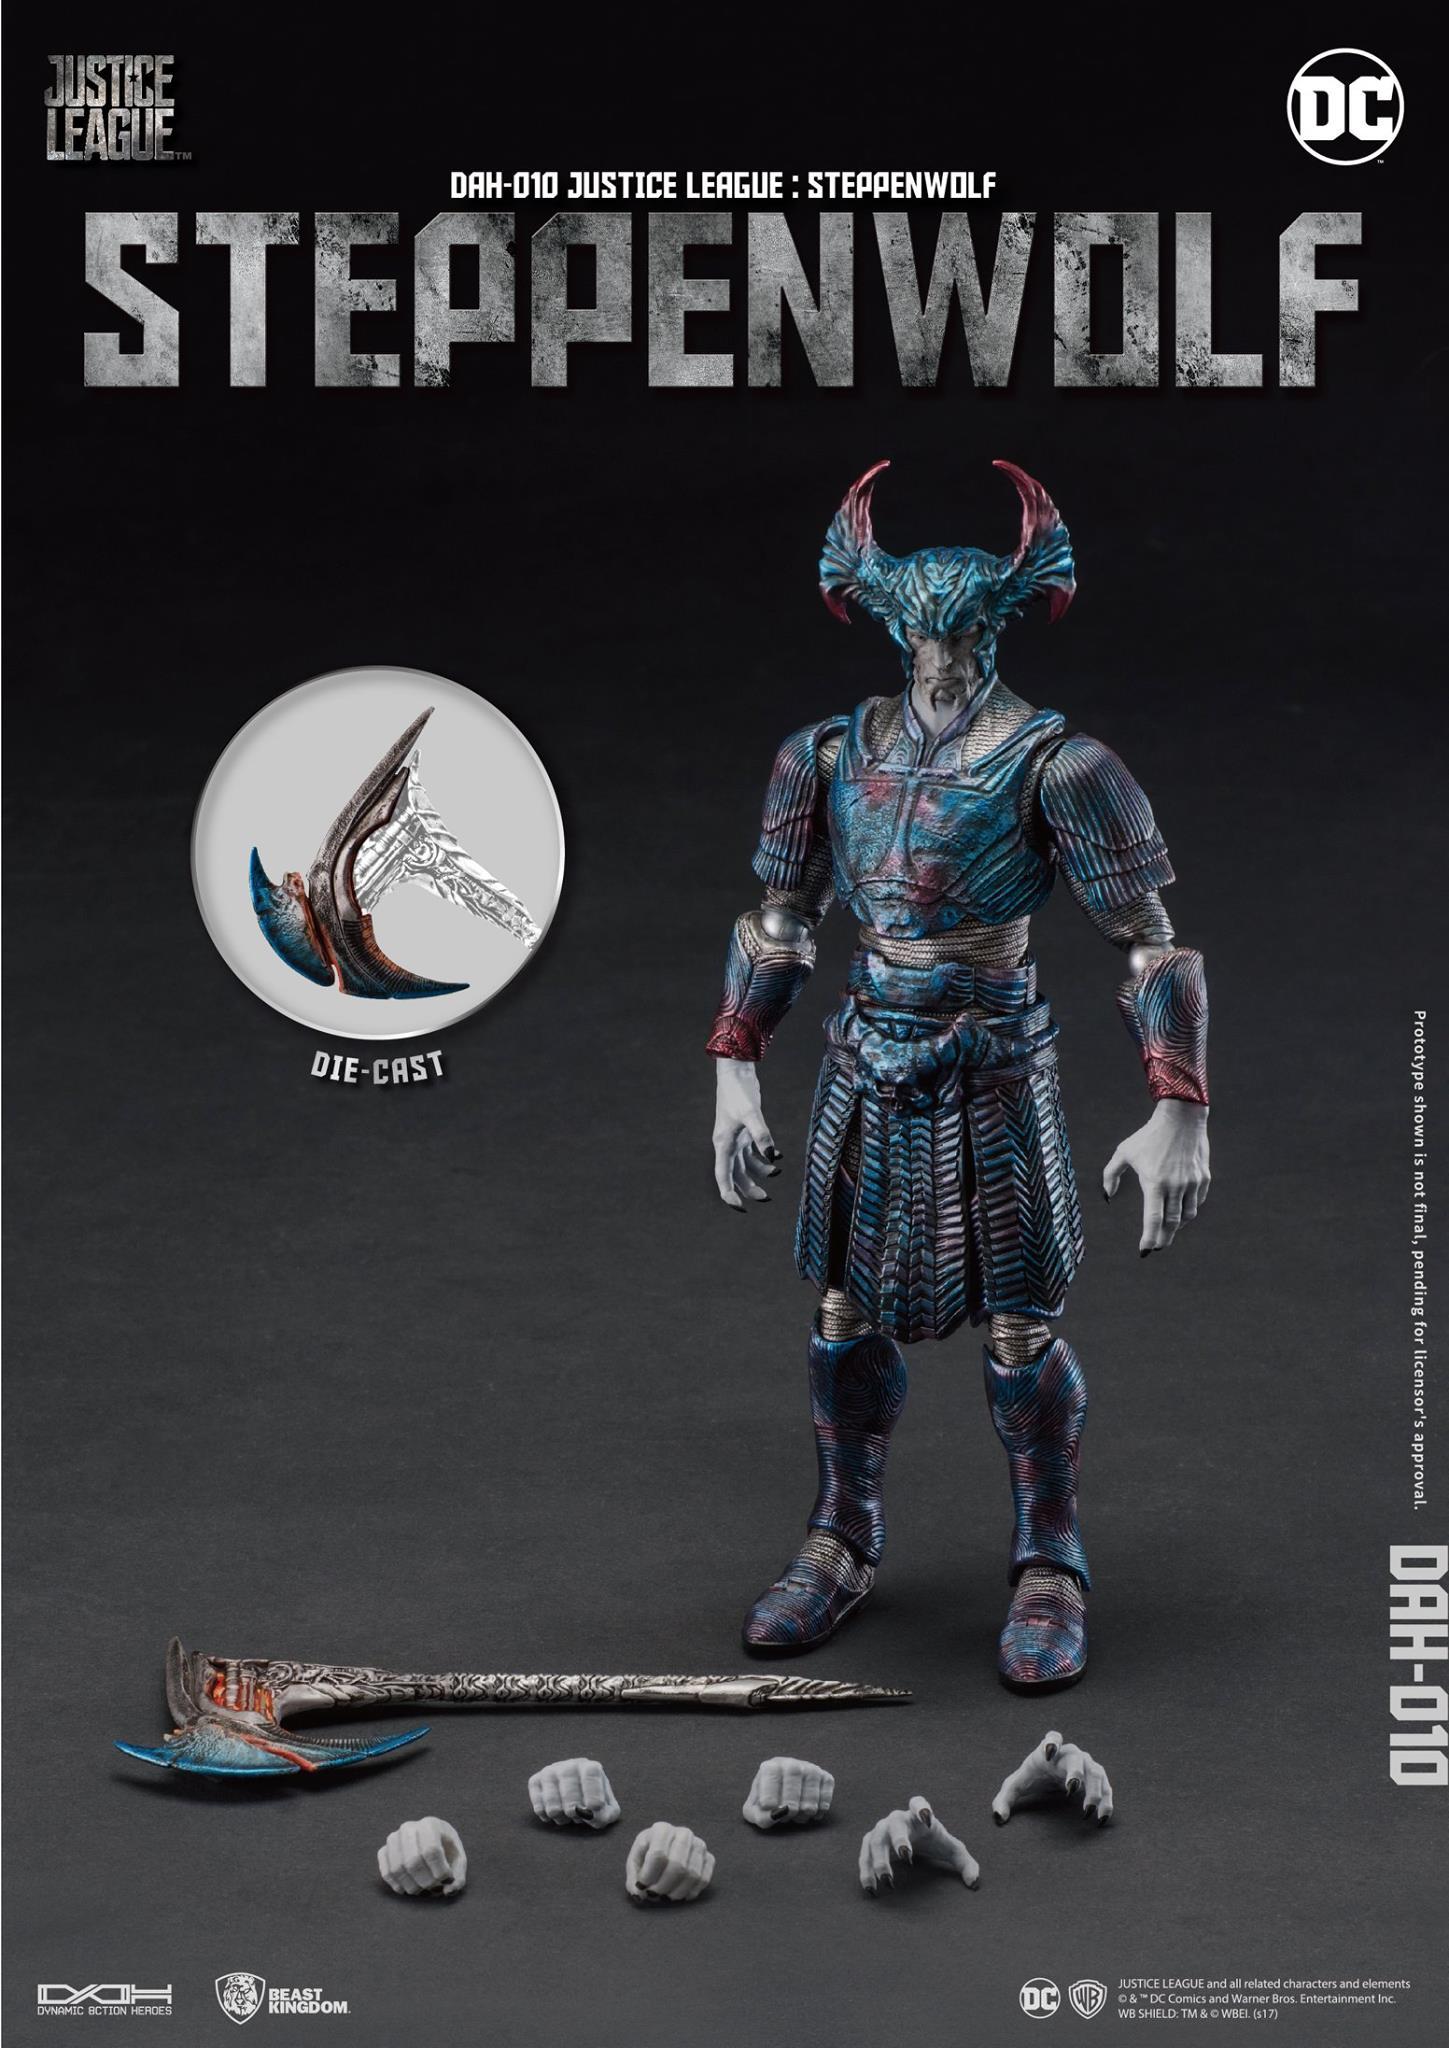 DAH-Justice-League-Steppenwolf-006